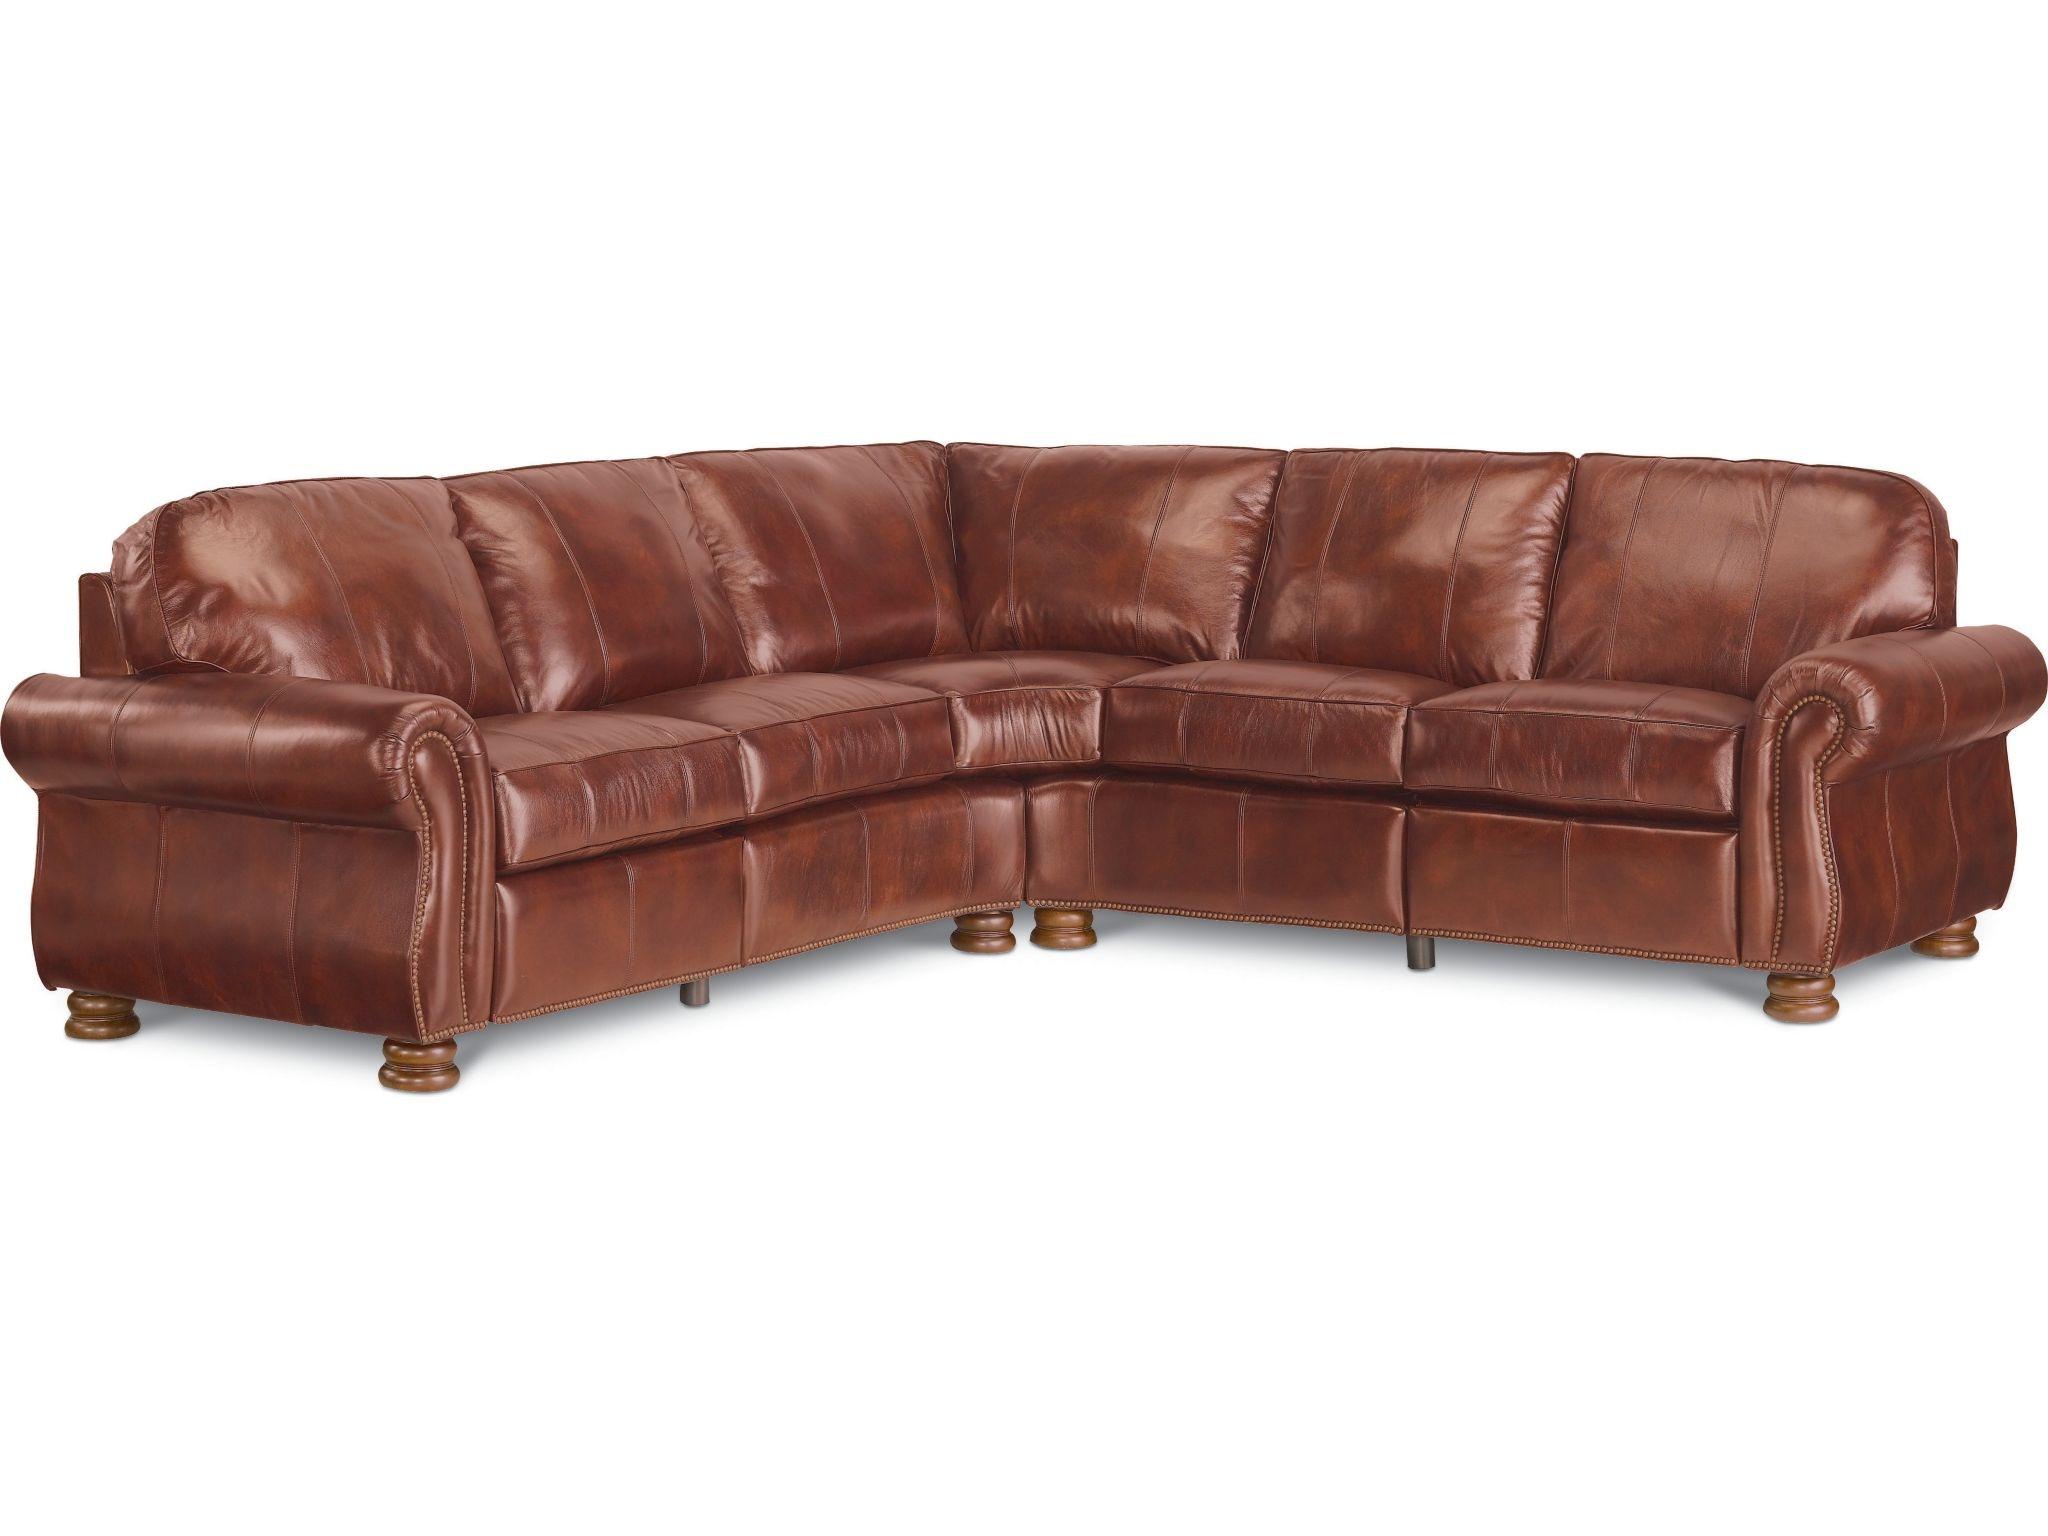 thomasville living room benjamin motion l a sofa with half wedge rh thomasvillenj com